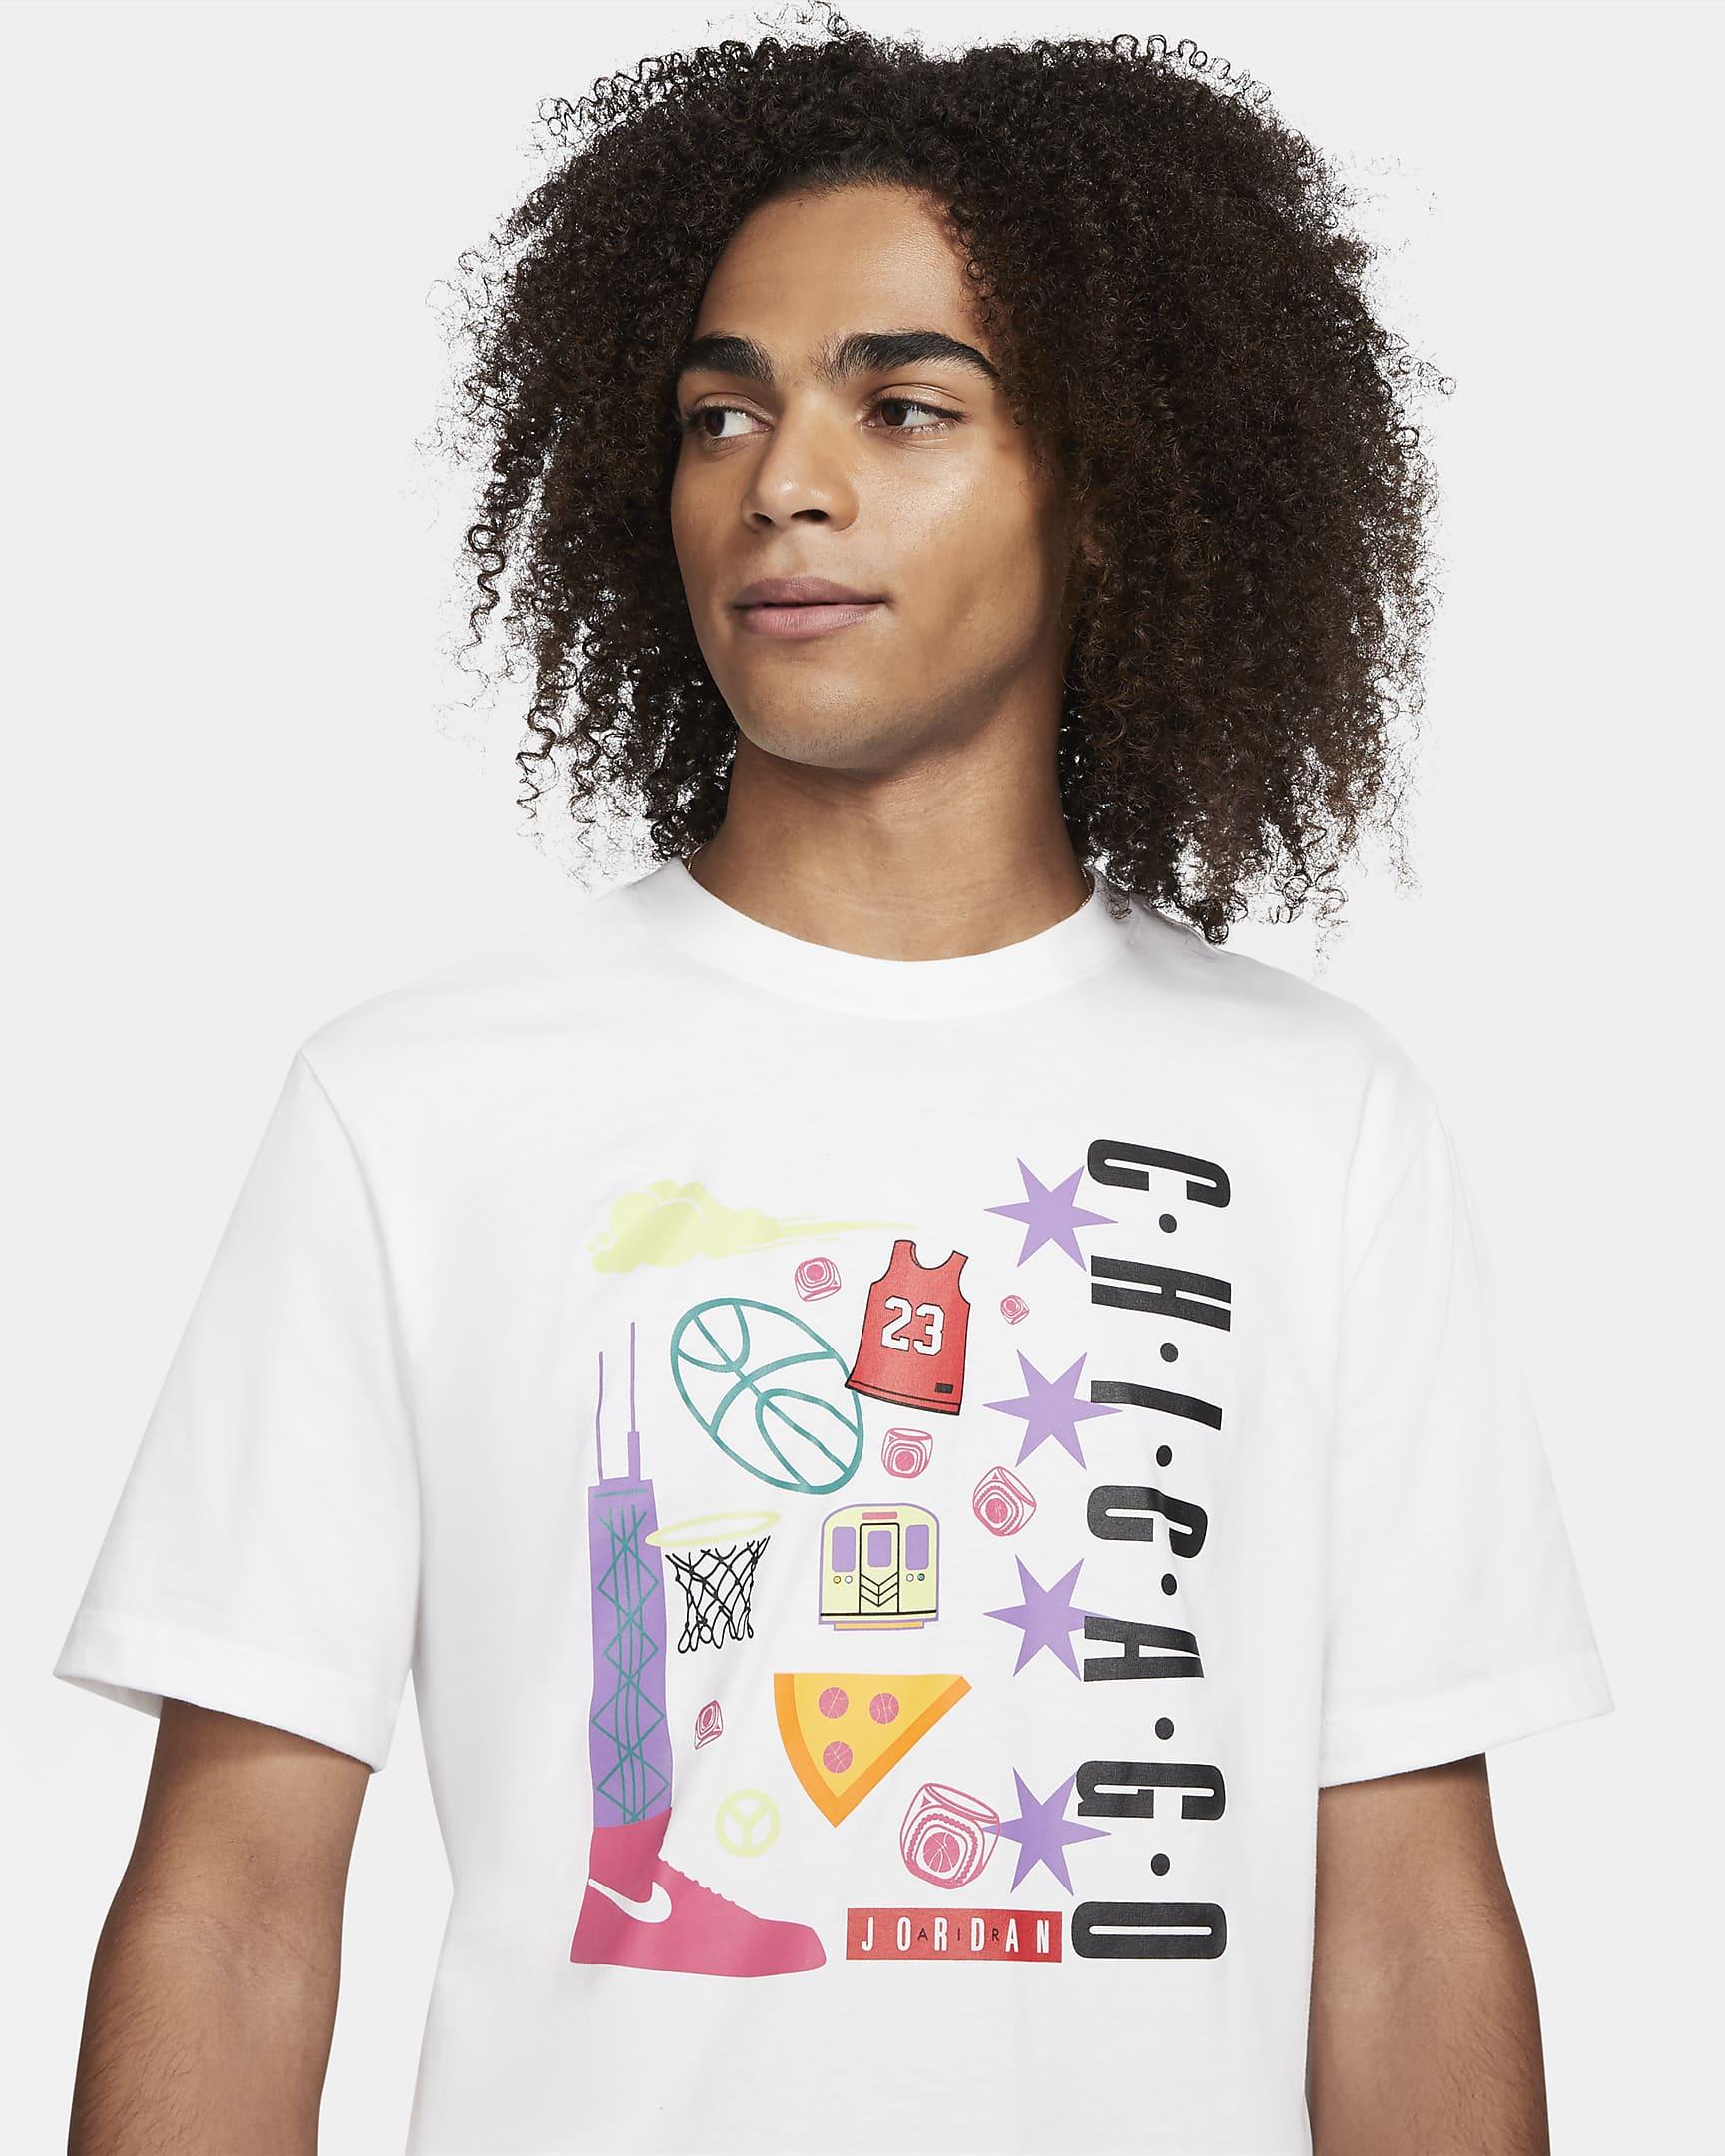 jordan-chicago-mens-short-sleeve-t-shirt-H6Z2DR-1